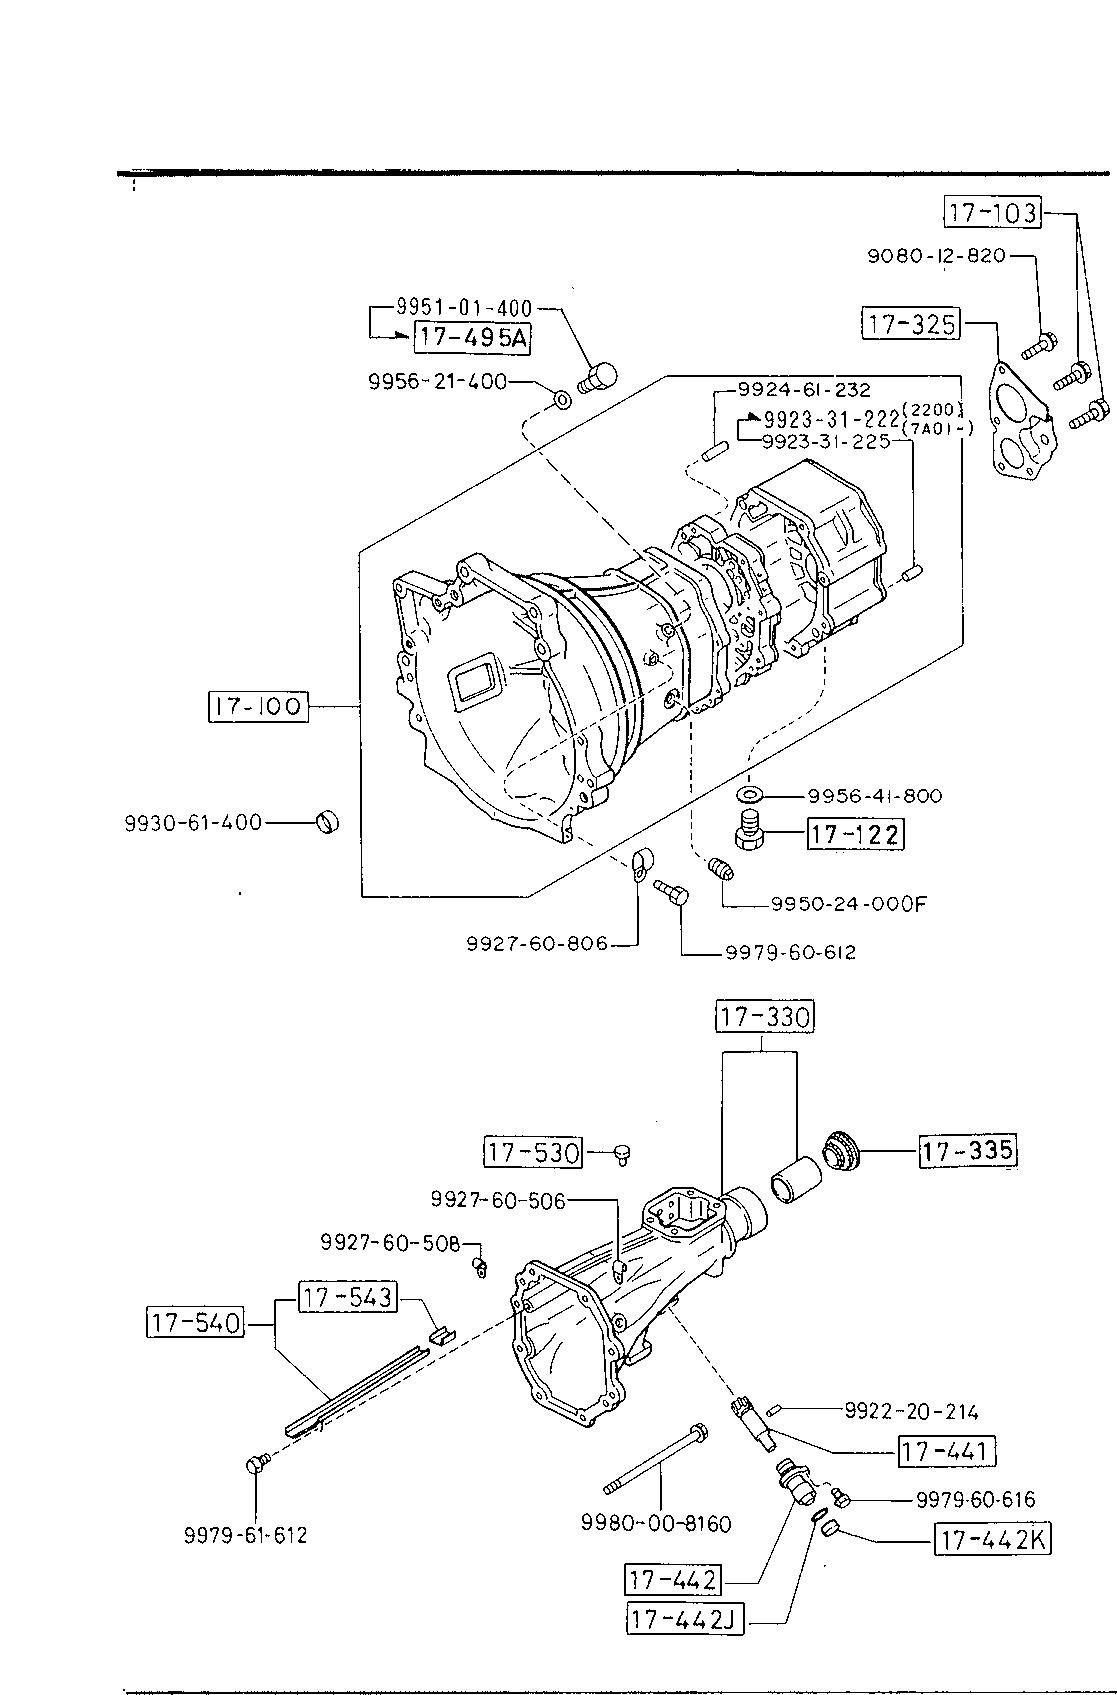 1989 mazda b2200 manual transmission